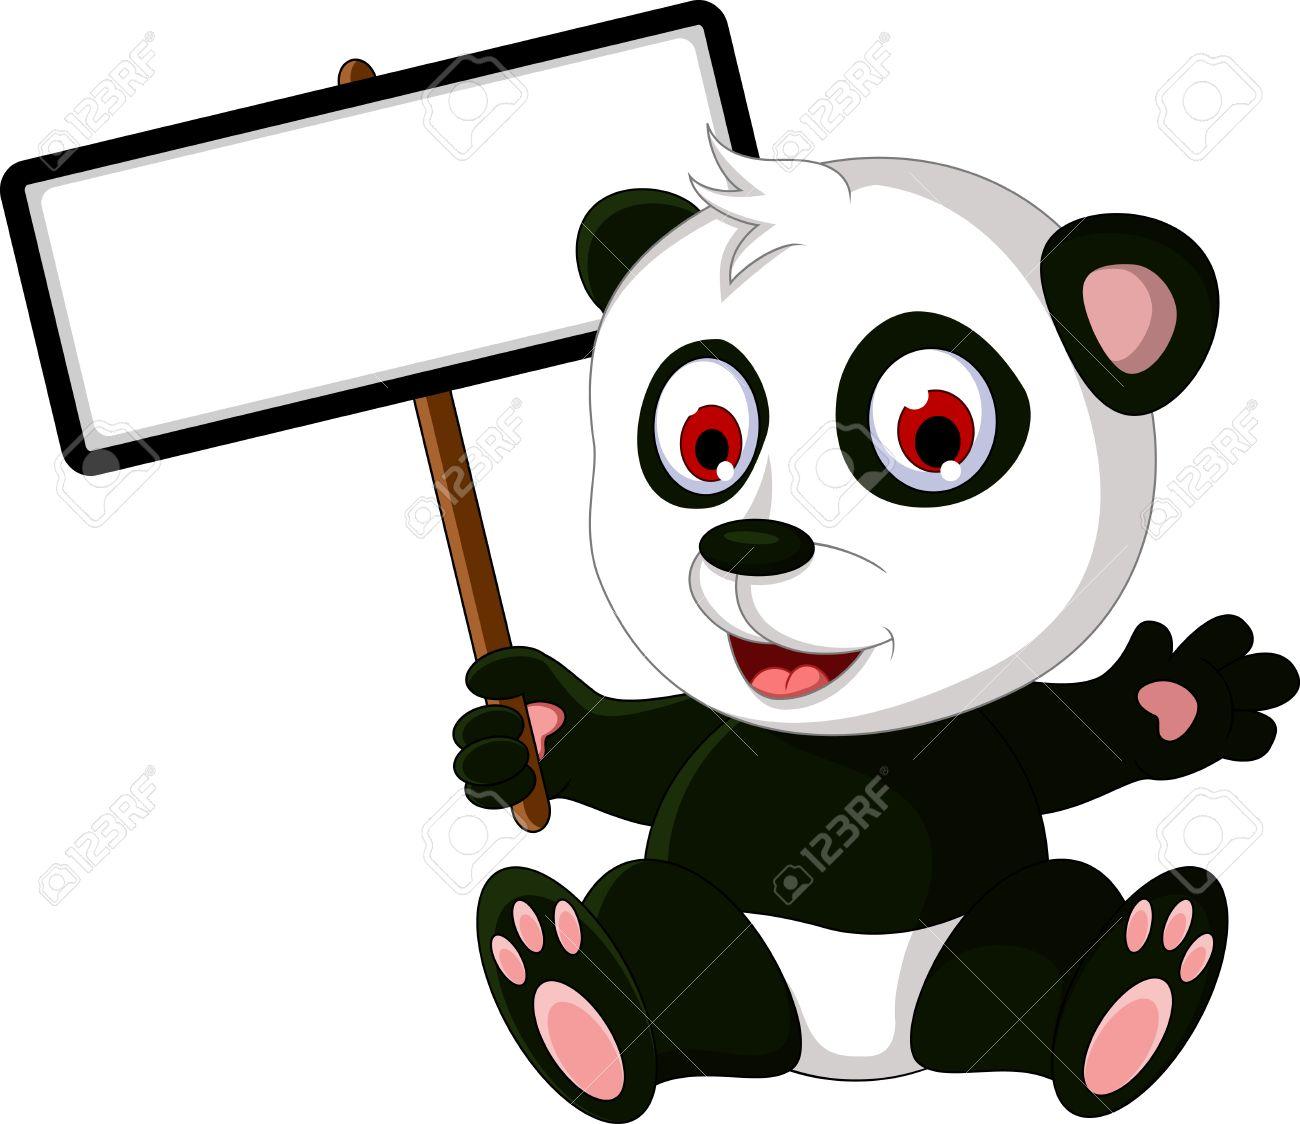 cute cartoon panda posing with white board royalty free cliparts rh 123rf com Cute Cartoon Unicorns Cute Cartoon Unicorns